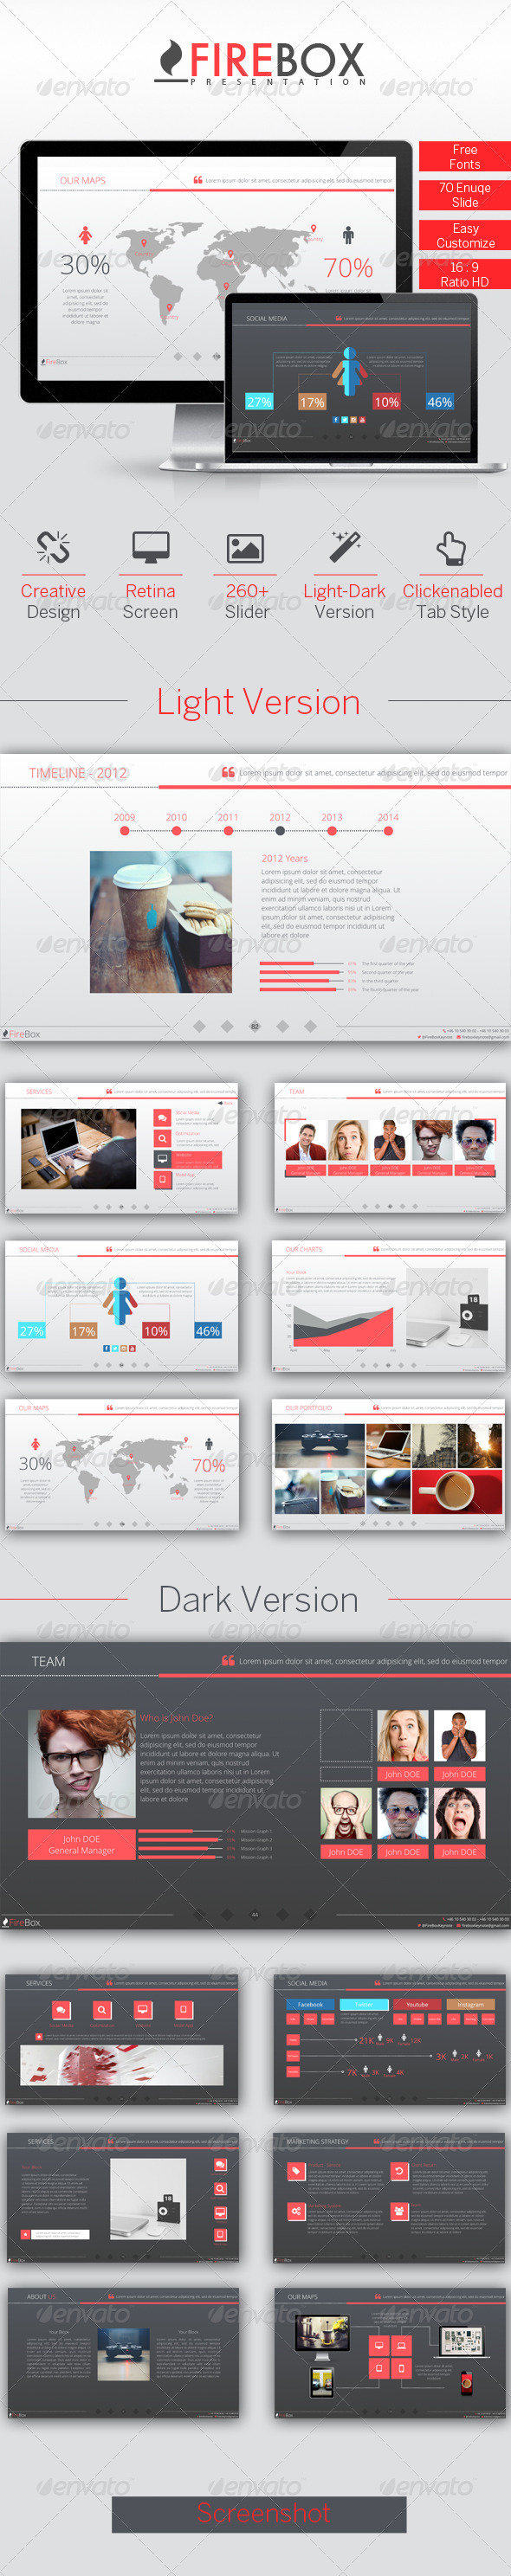 GraphicRiver FireBox Creative Keynote Presentation Template 7672749